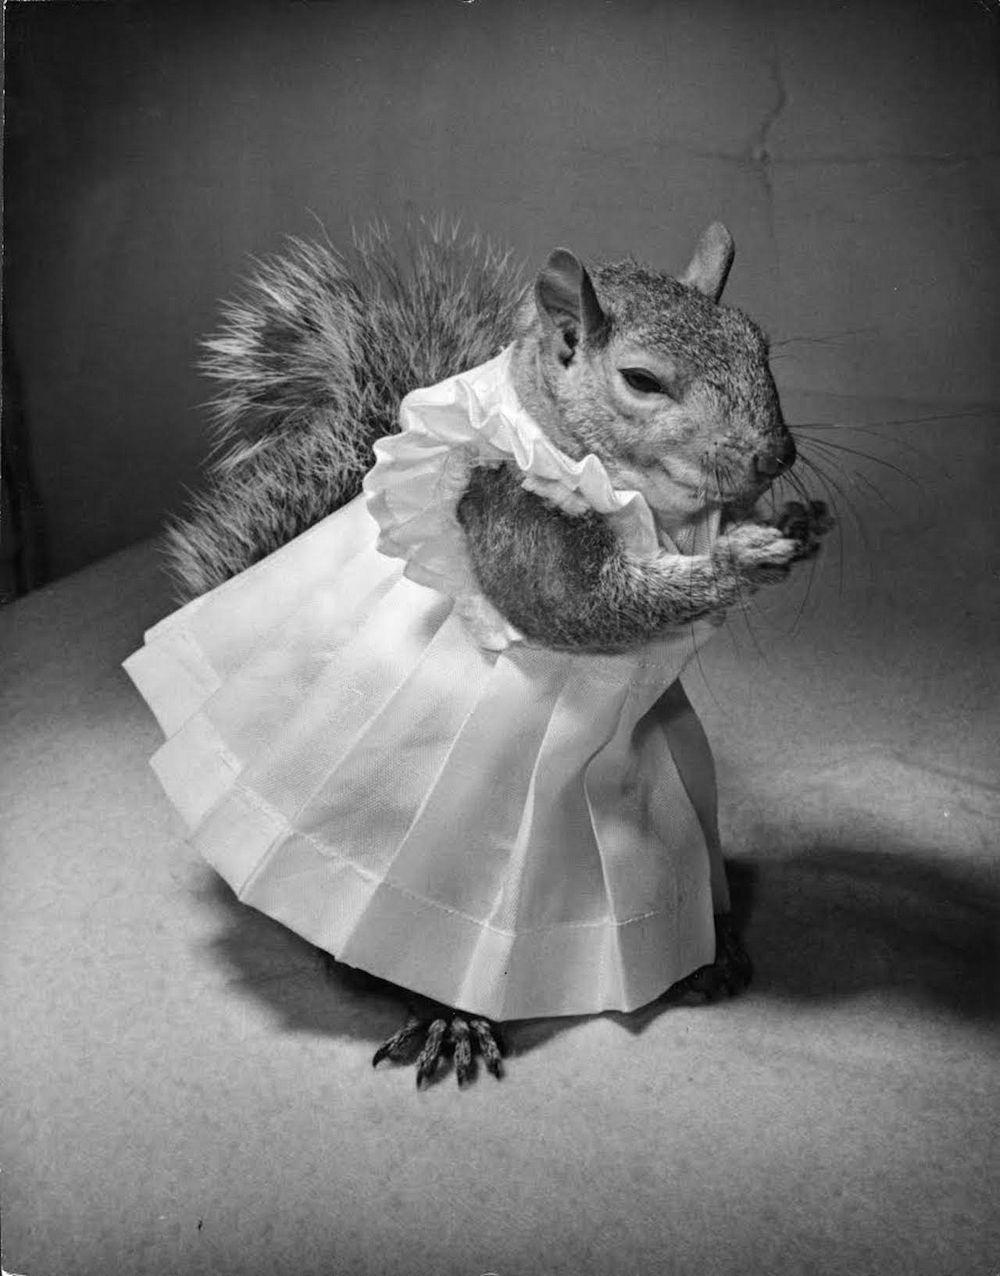 tommy-tucker-squirrel-7